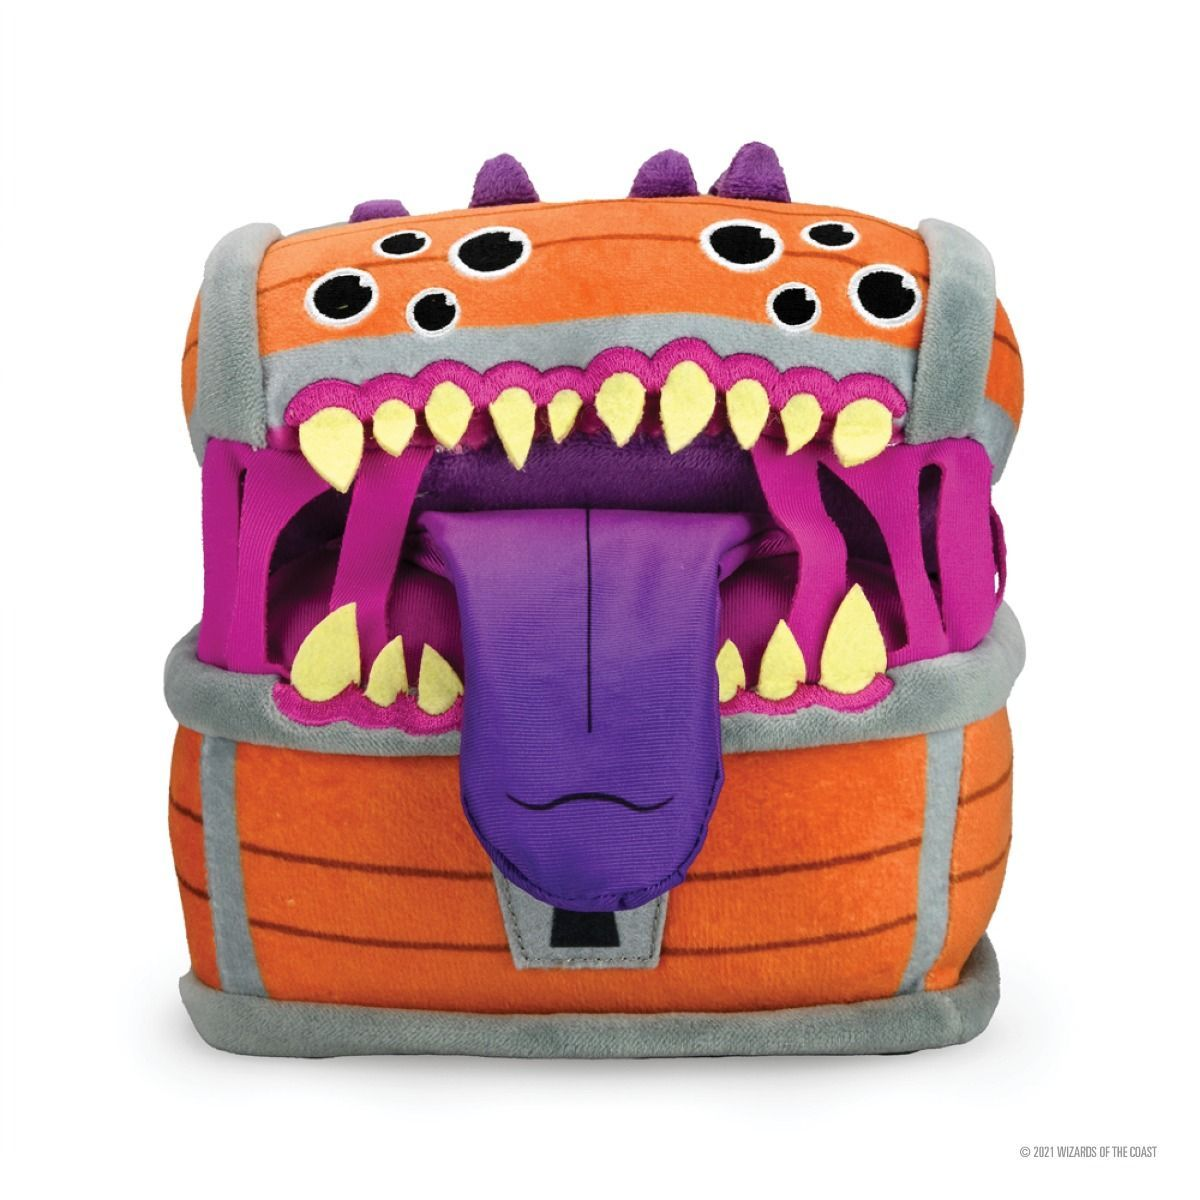 Dungeons & Dragons Mimic Phunny Plush by Kidrobot